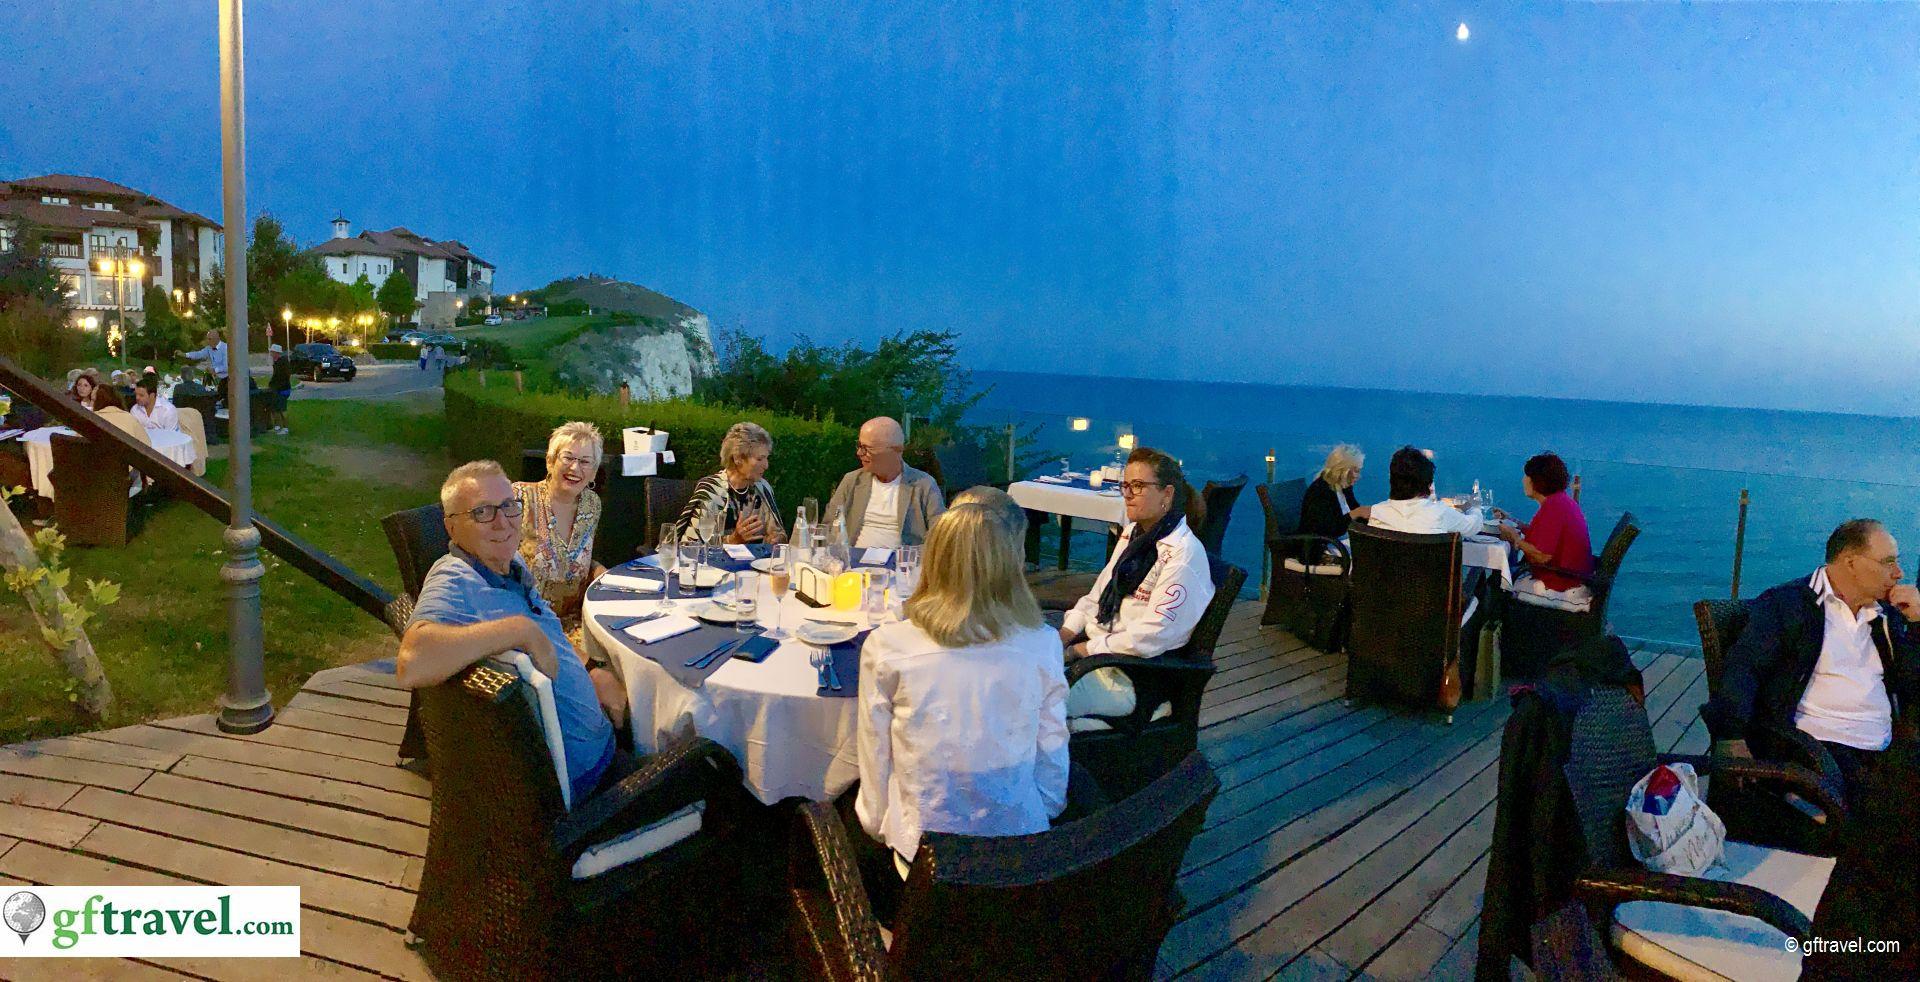 Golf-Gruppenreise-Bulgarien-Thracian-Cliffs-Restaurant-Geti-Welcome-Dinner